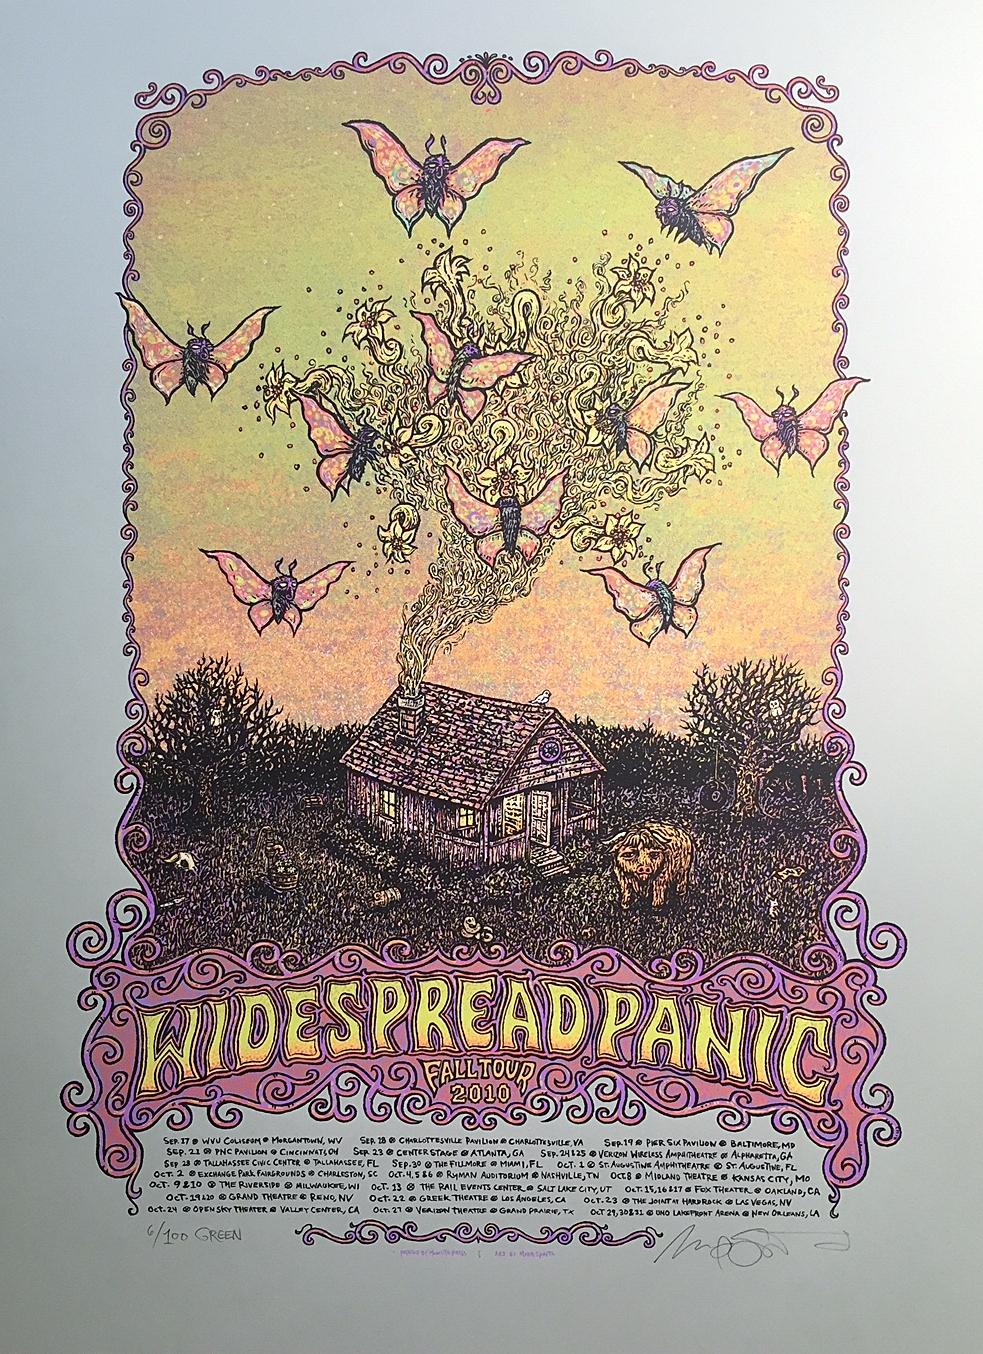 Widespread Panic Fall Tour 2010